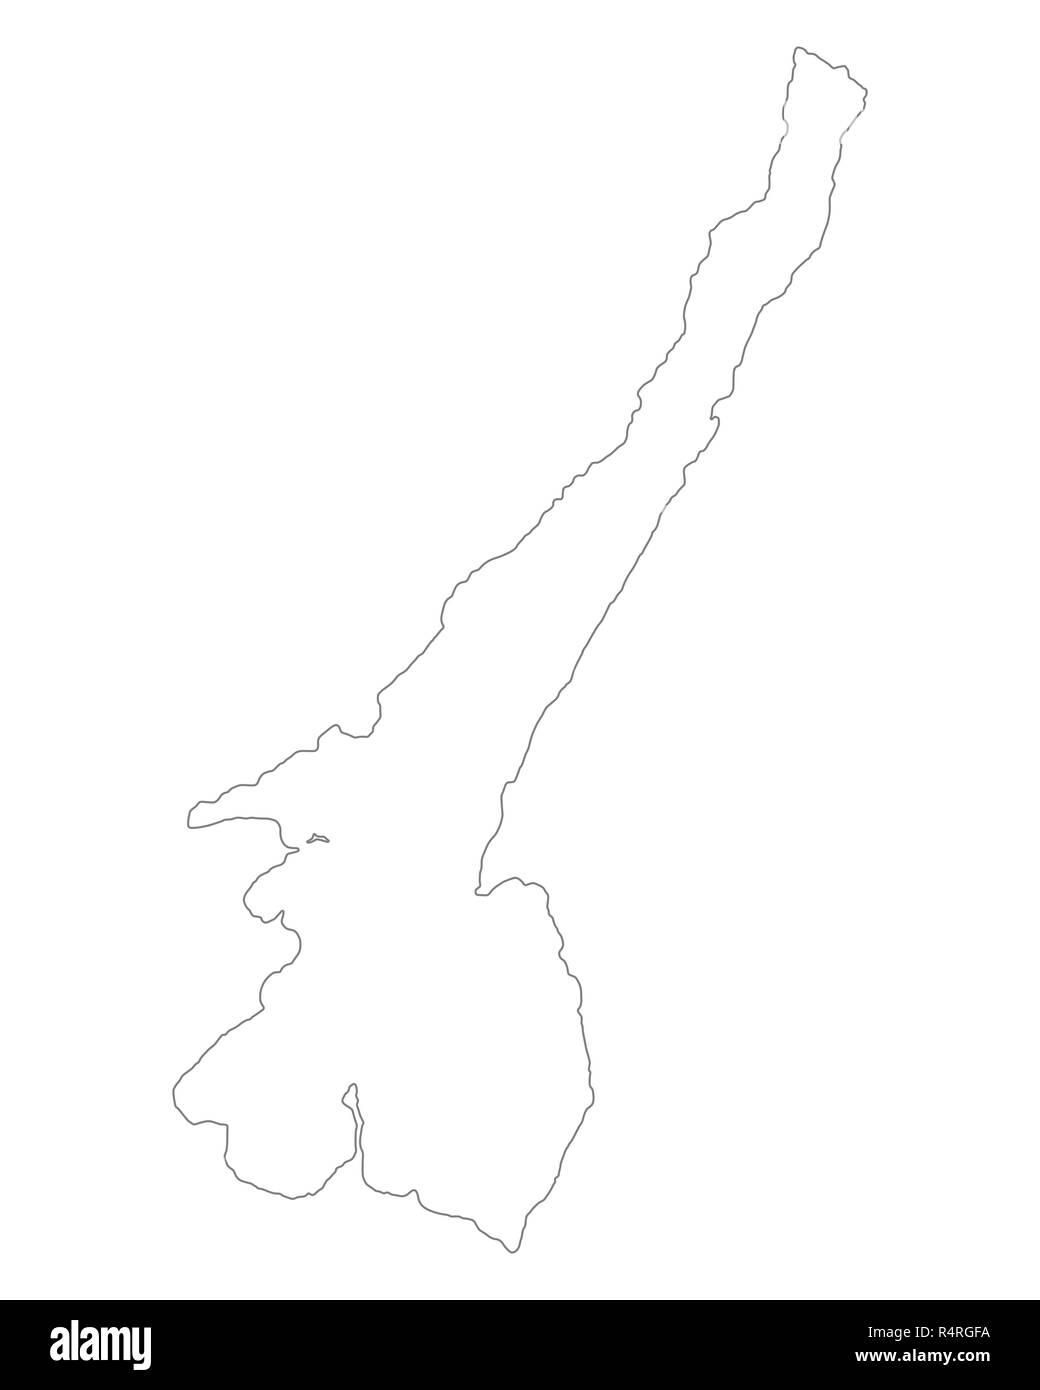 Cartina Geografica Muta Dell Africa Pieterduisenberg